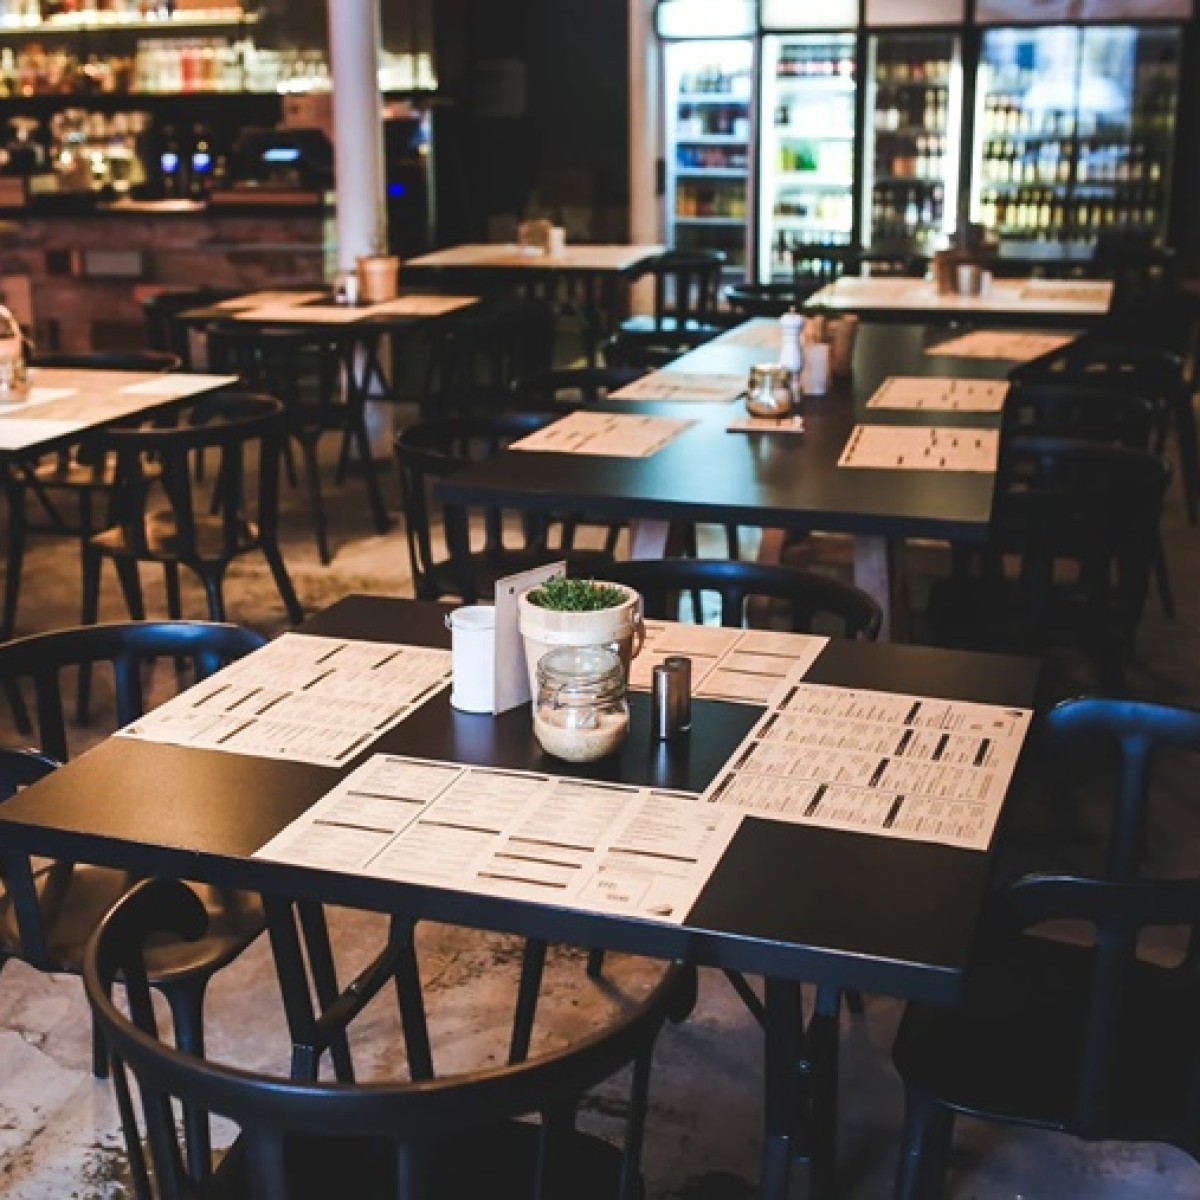 Coronavirus in Mumbai: Koko restaurant staff tests positive for COVID-19